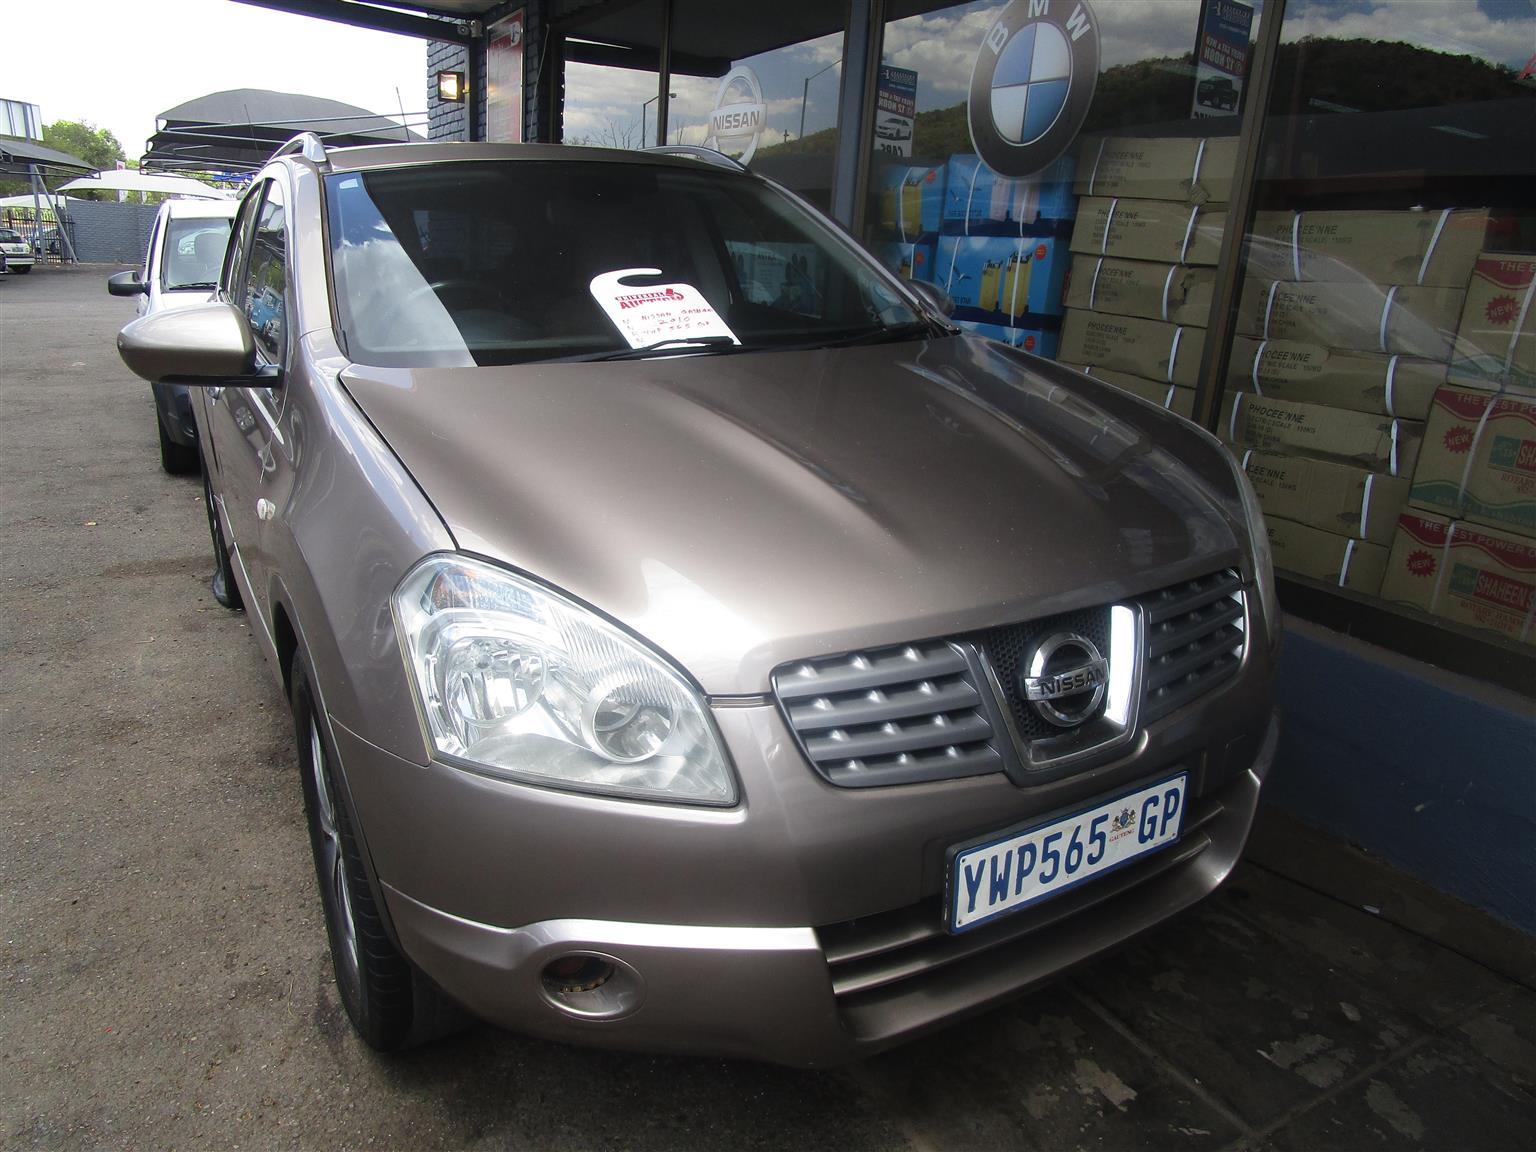 2010 Nissan Qashqai QASHQAI 1.5 dCi TEKNA